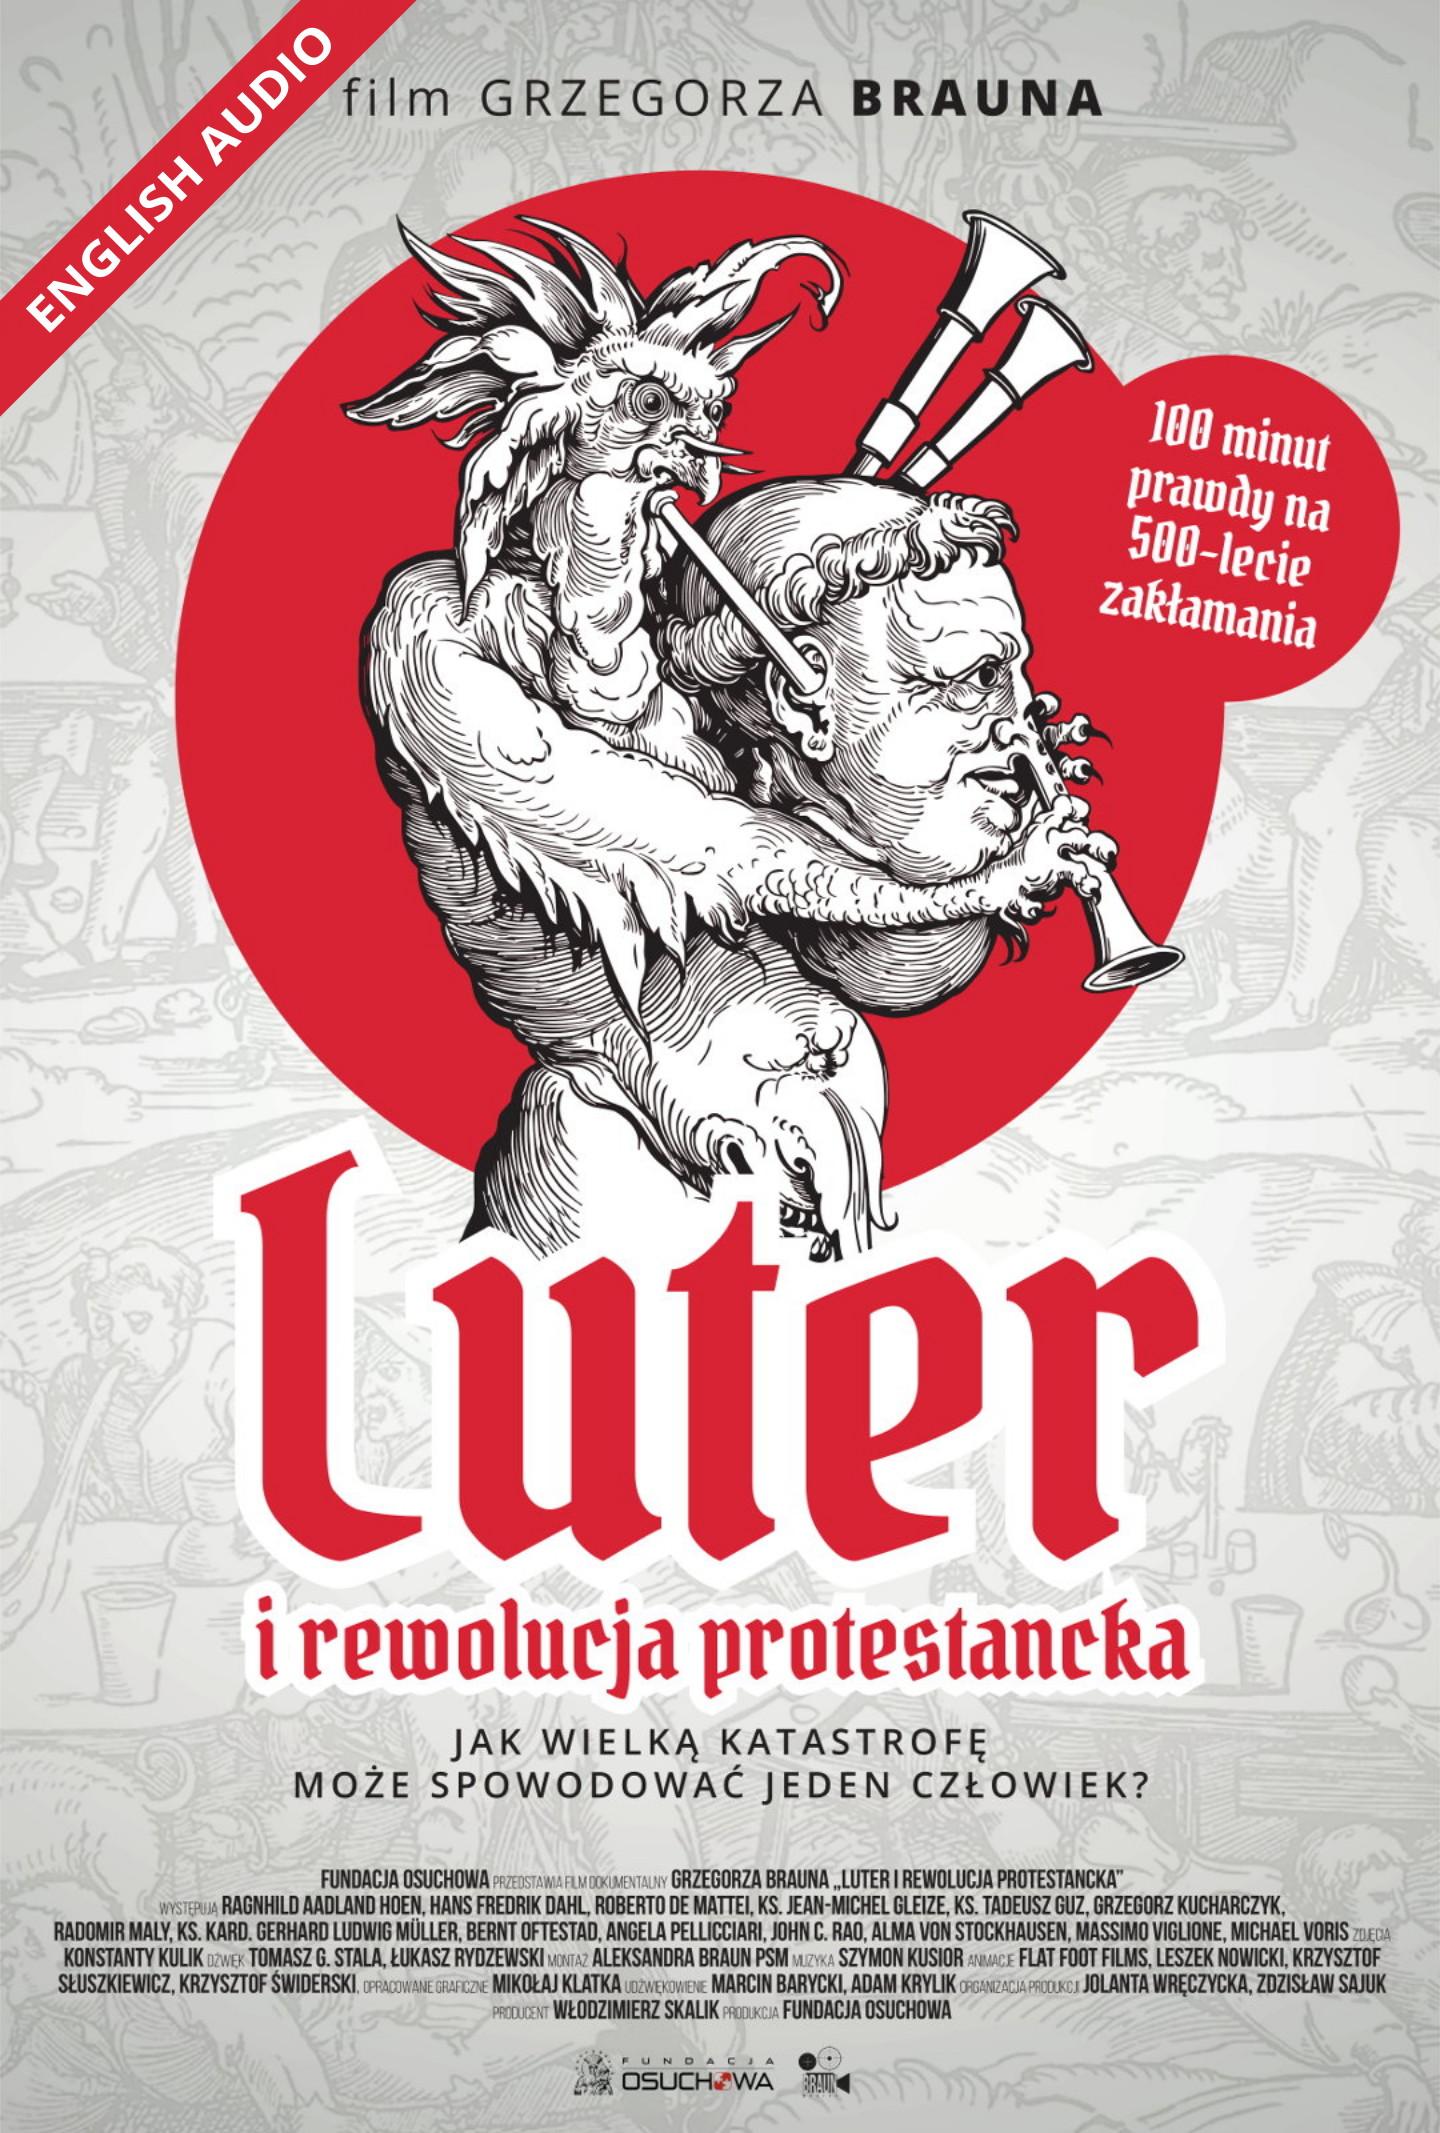 Catholic reformation protestant Martin Luther history documentary film media  heresy Poland